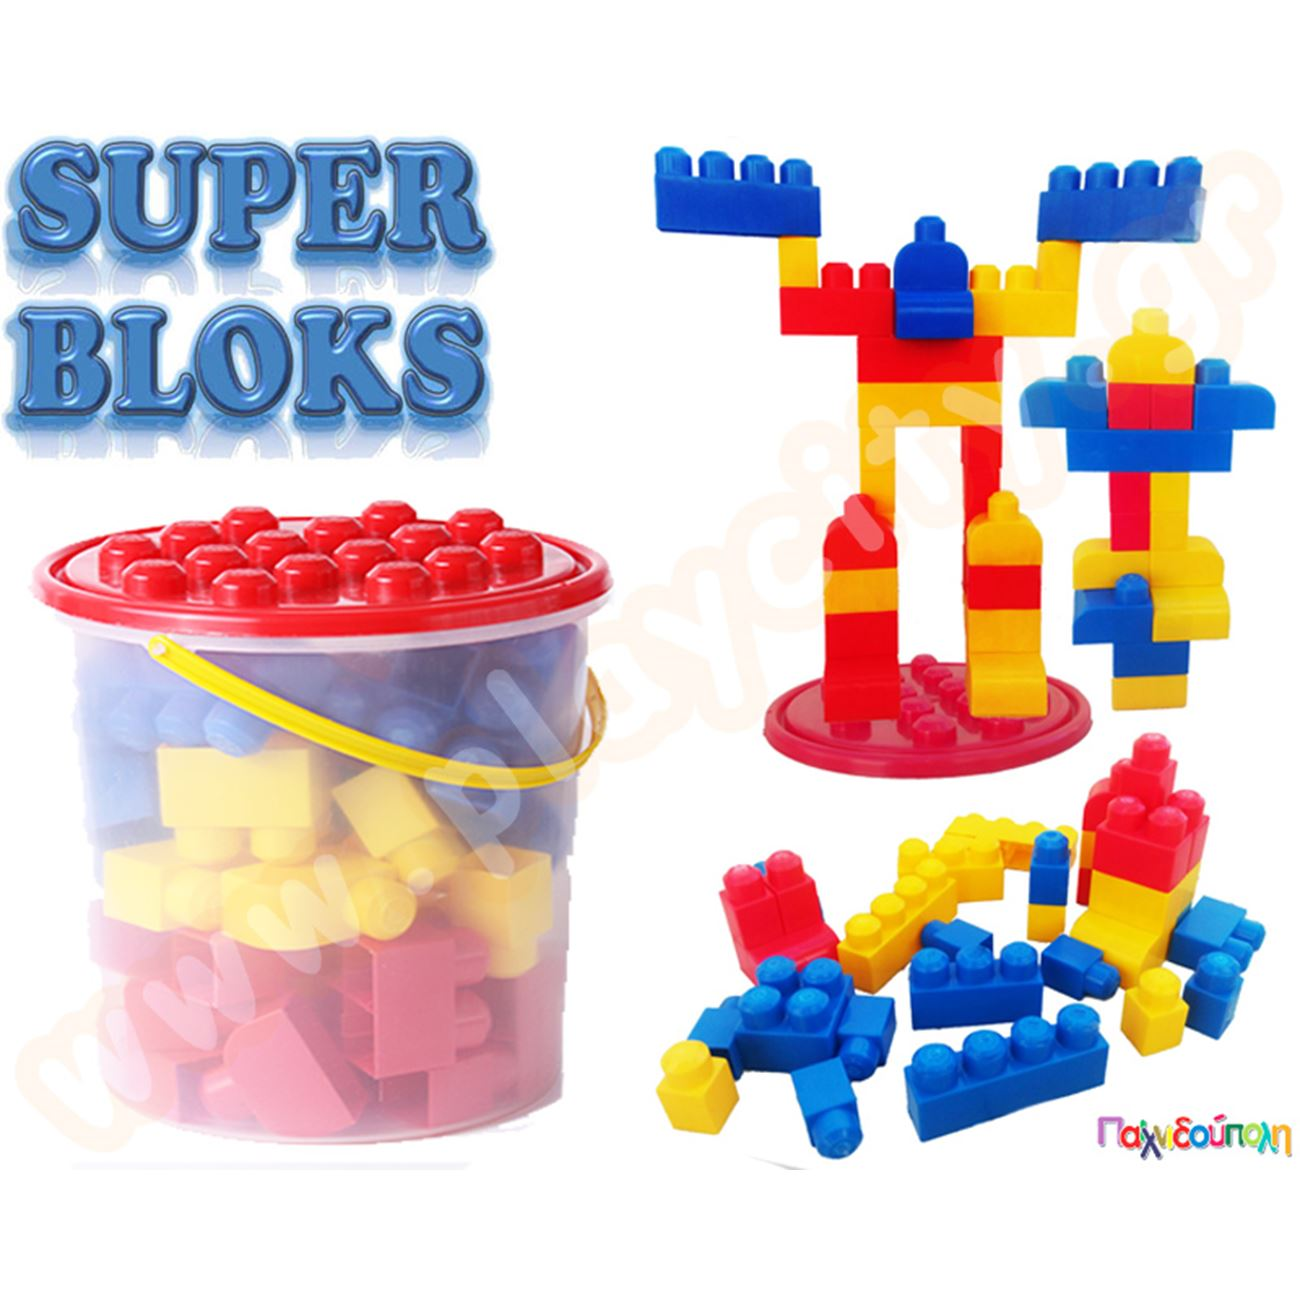 6362ef8a976 Κούνιες για μωρά και παιδιά Super κουβάς με 48 τουβλάκια (κόκκινο ...